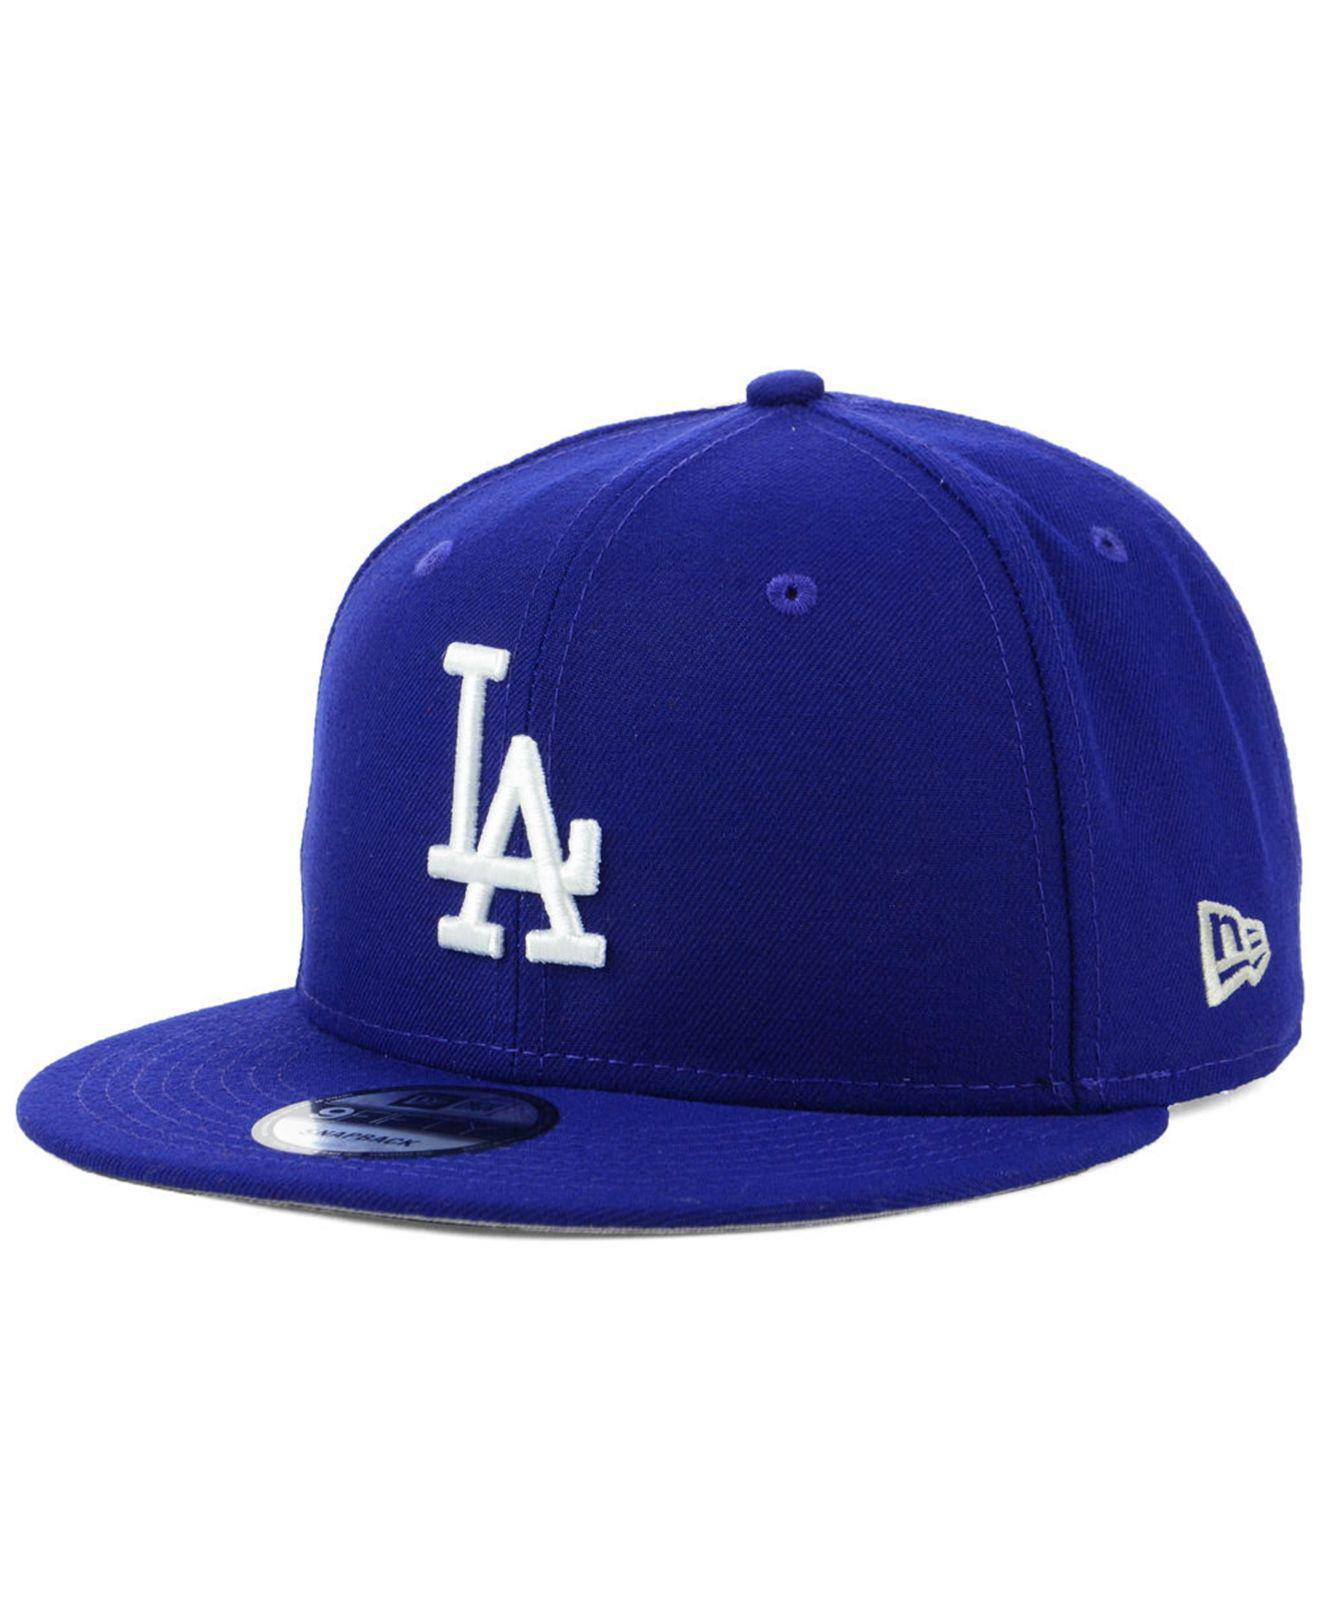 e8717195e3f4f Lyst - KTZ Los Angeles Dodgers Title Trim 9fifty Snapback Cap in ...